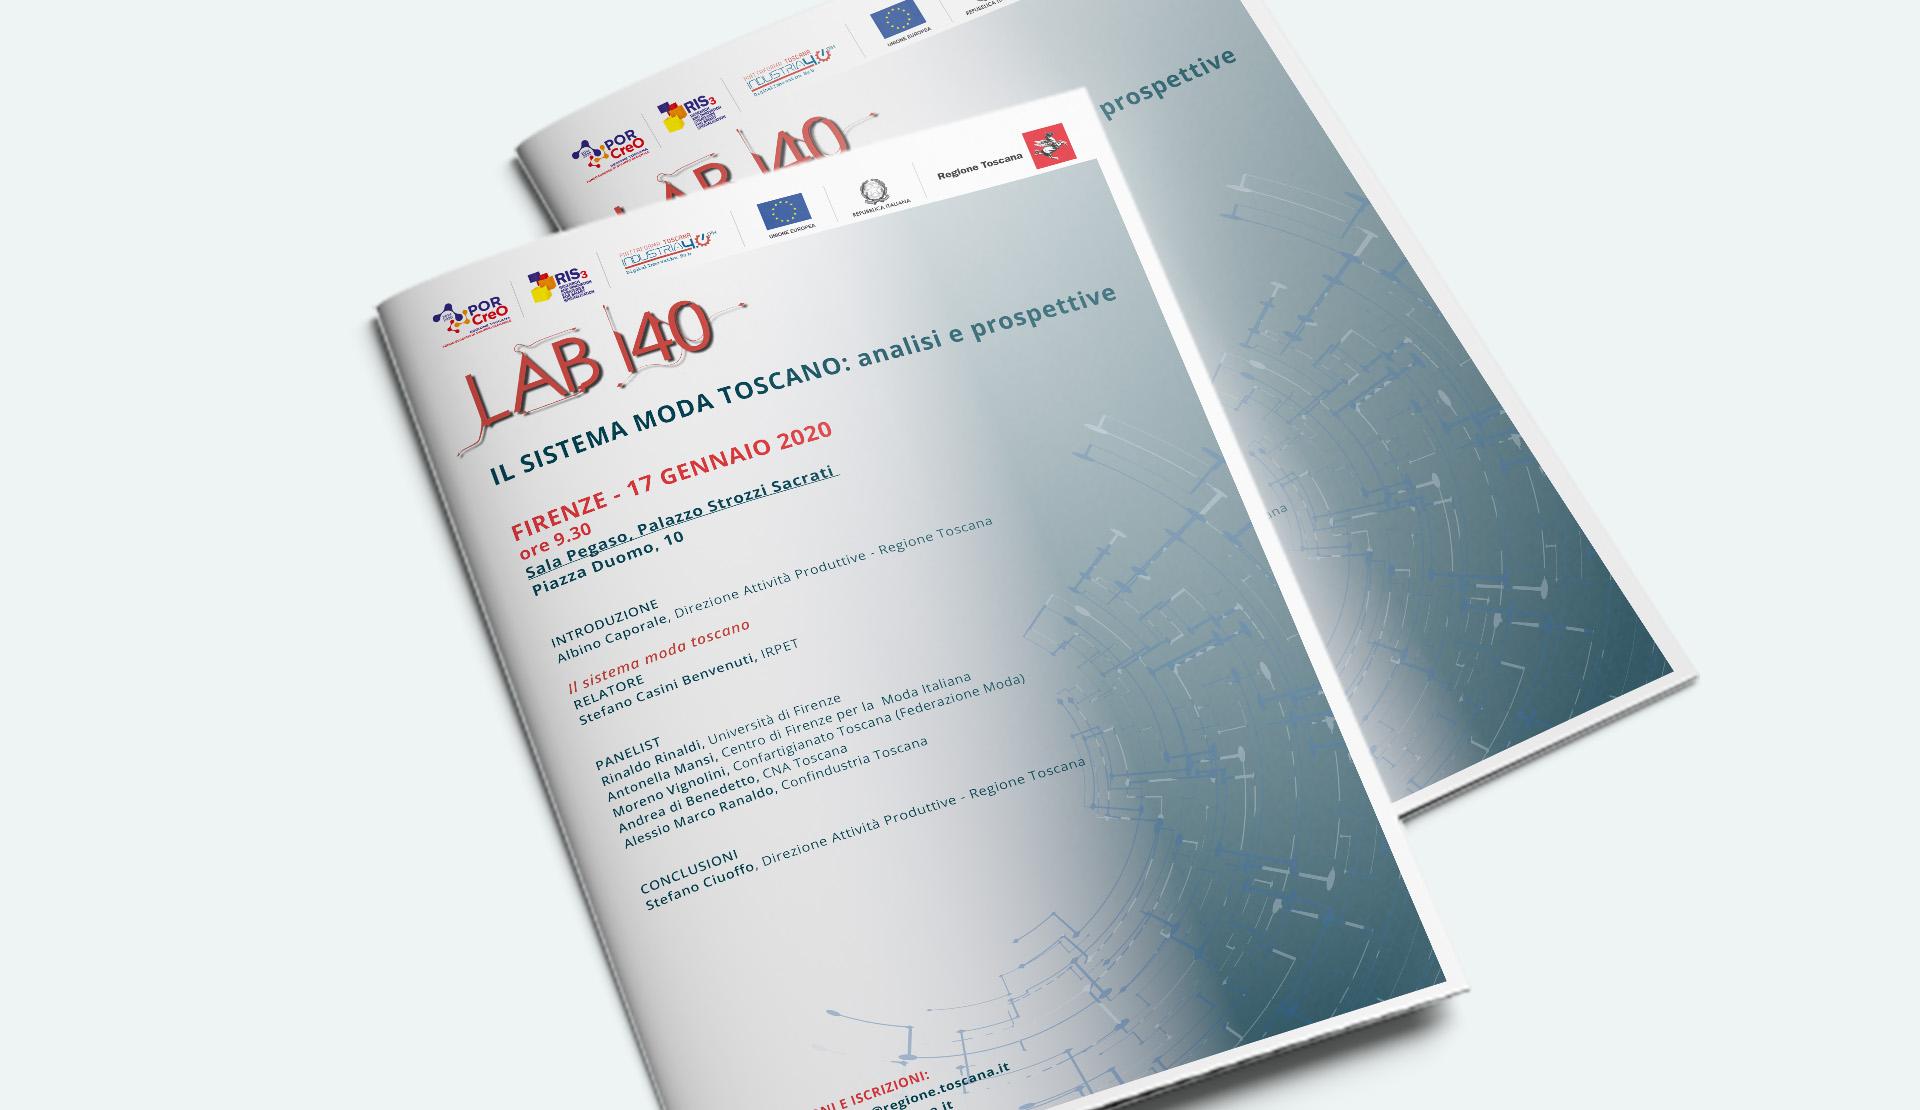 CTM news Lab I40 17.1.2020